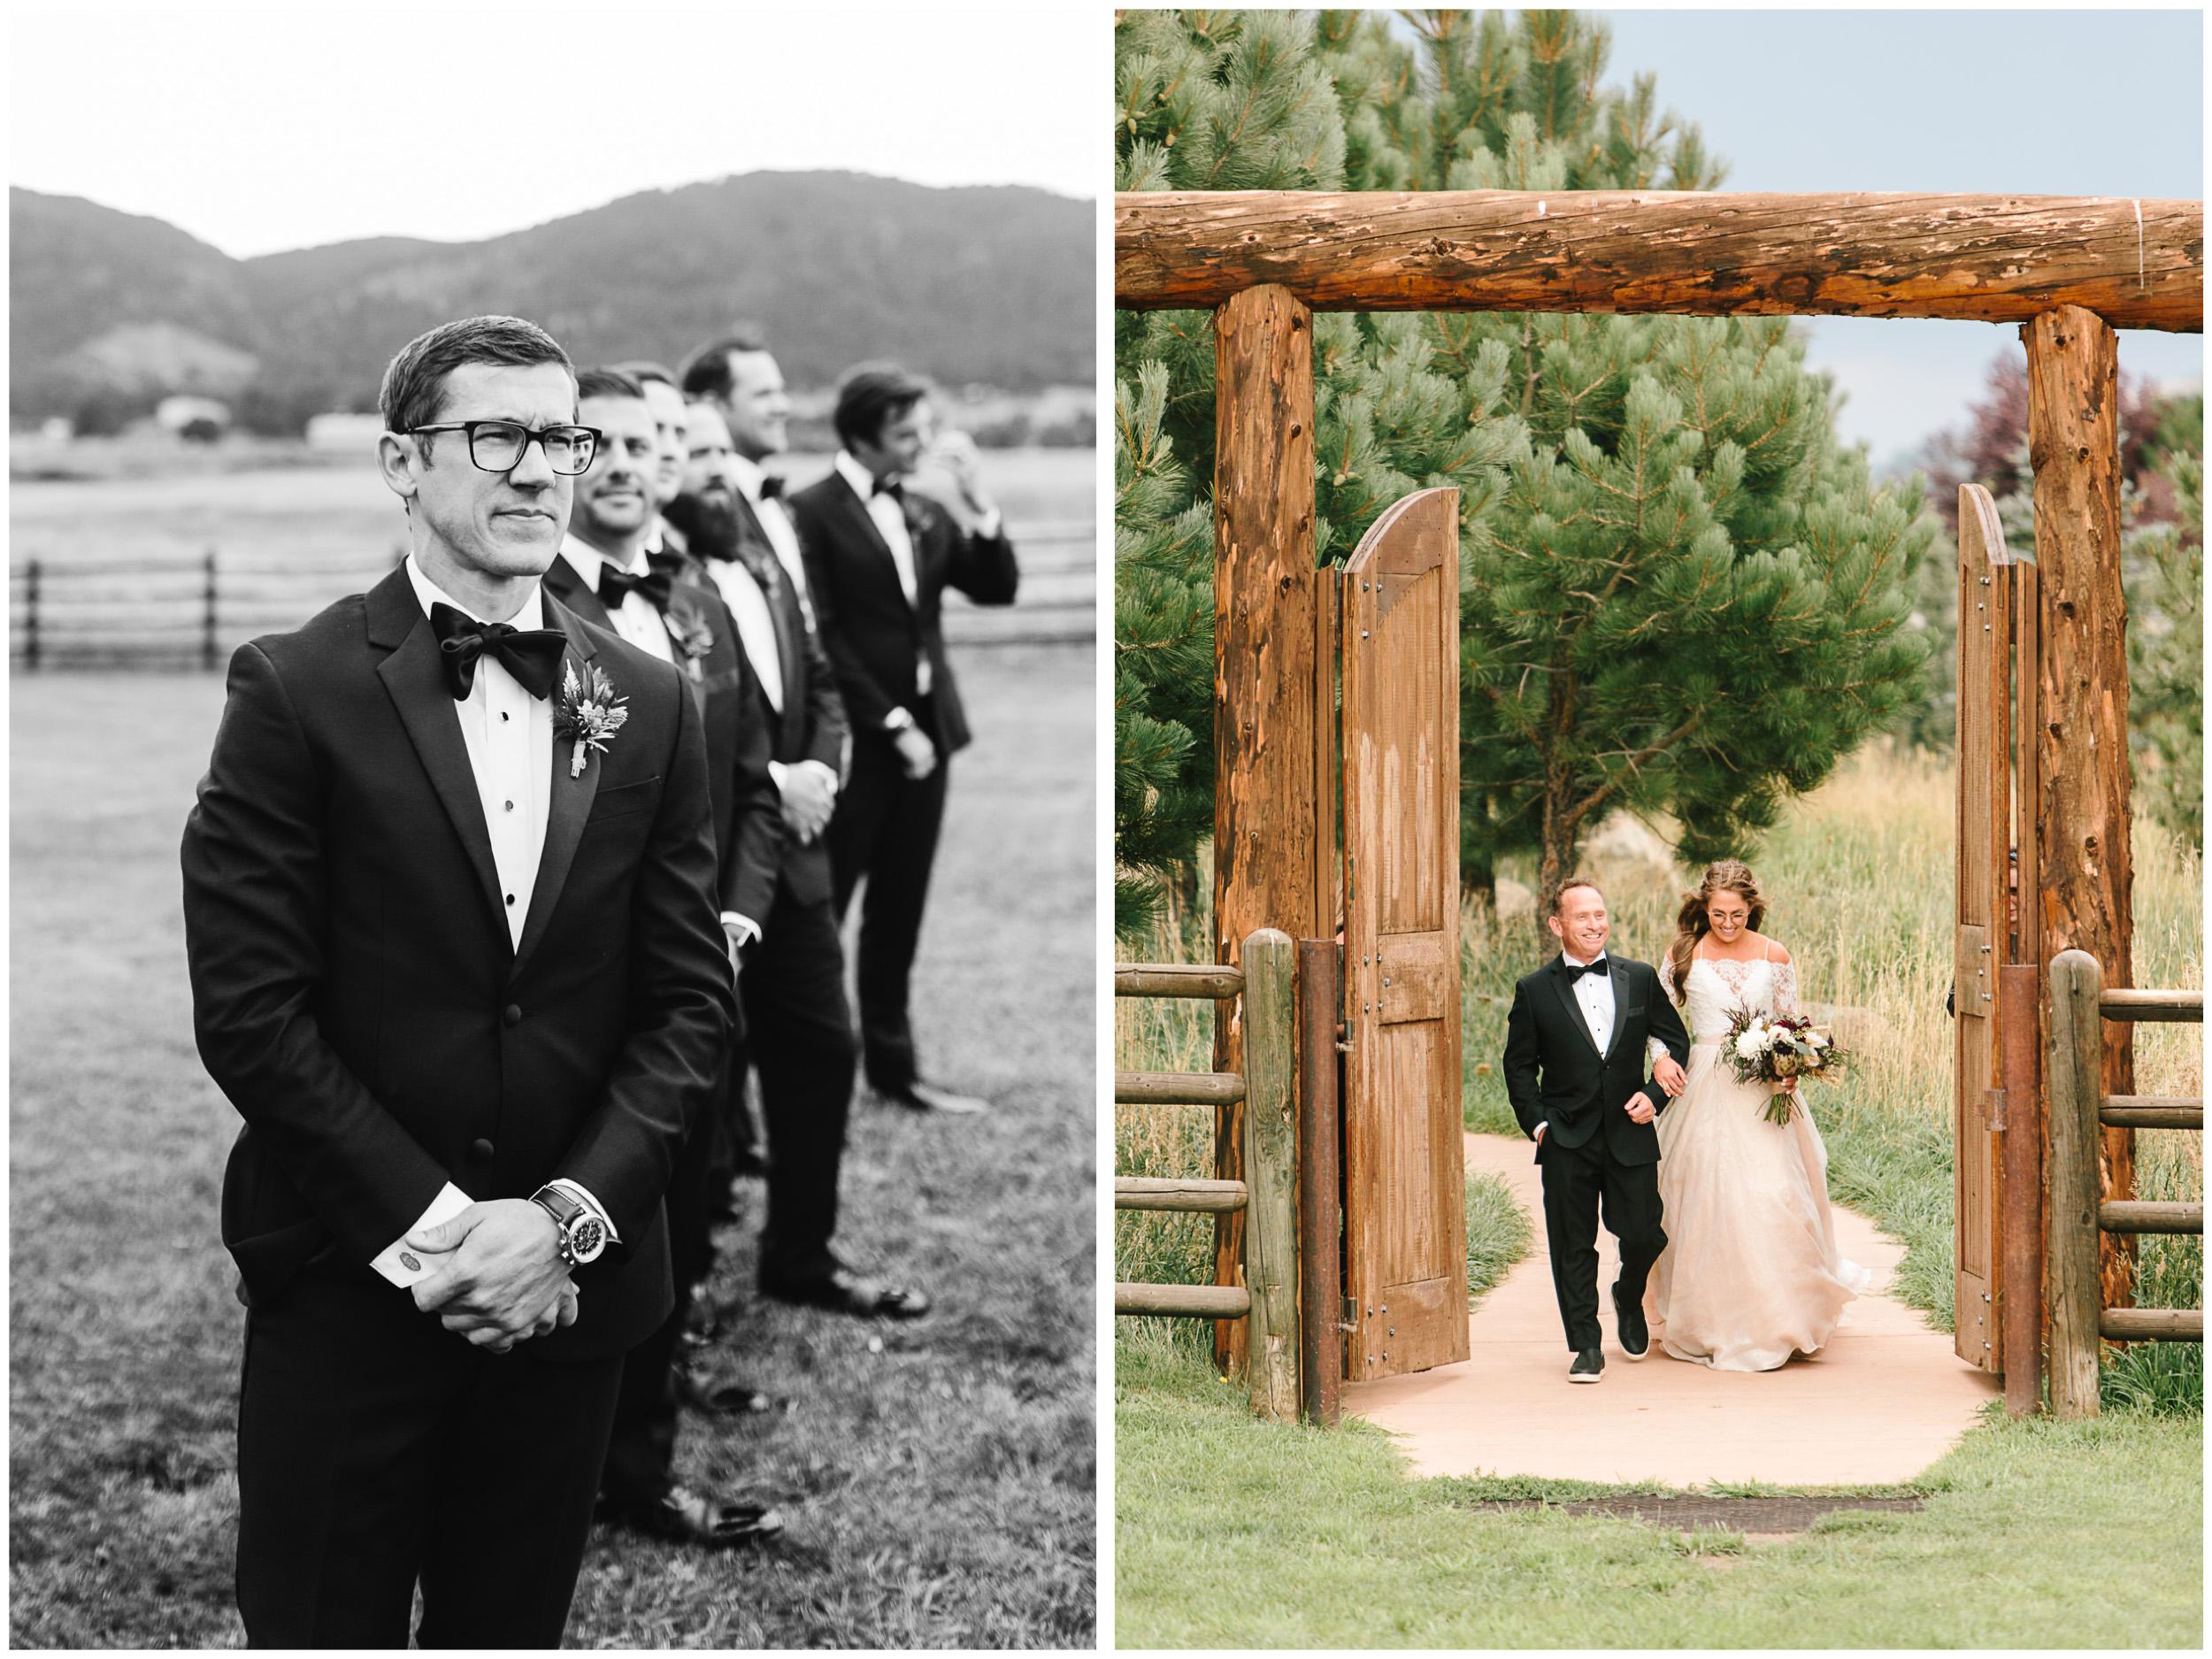 spruce_mountain_ranch_wedding_50.jpg